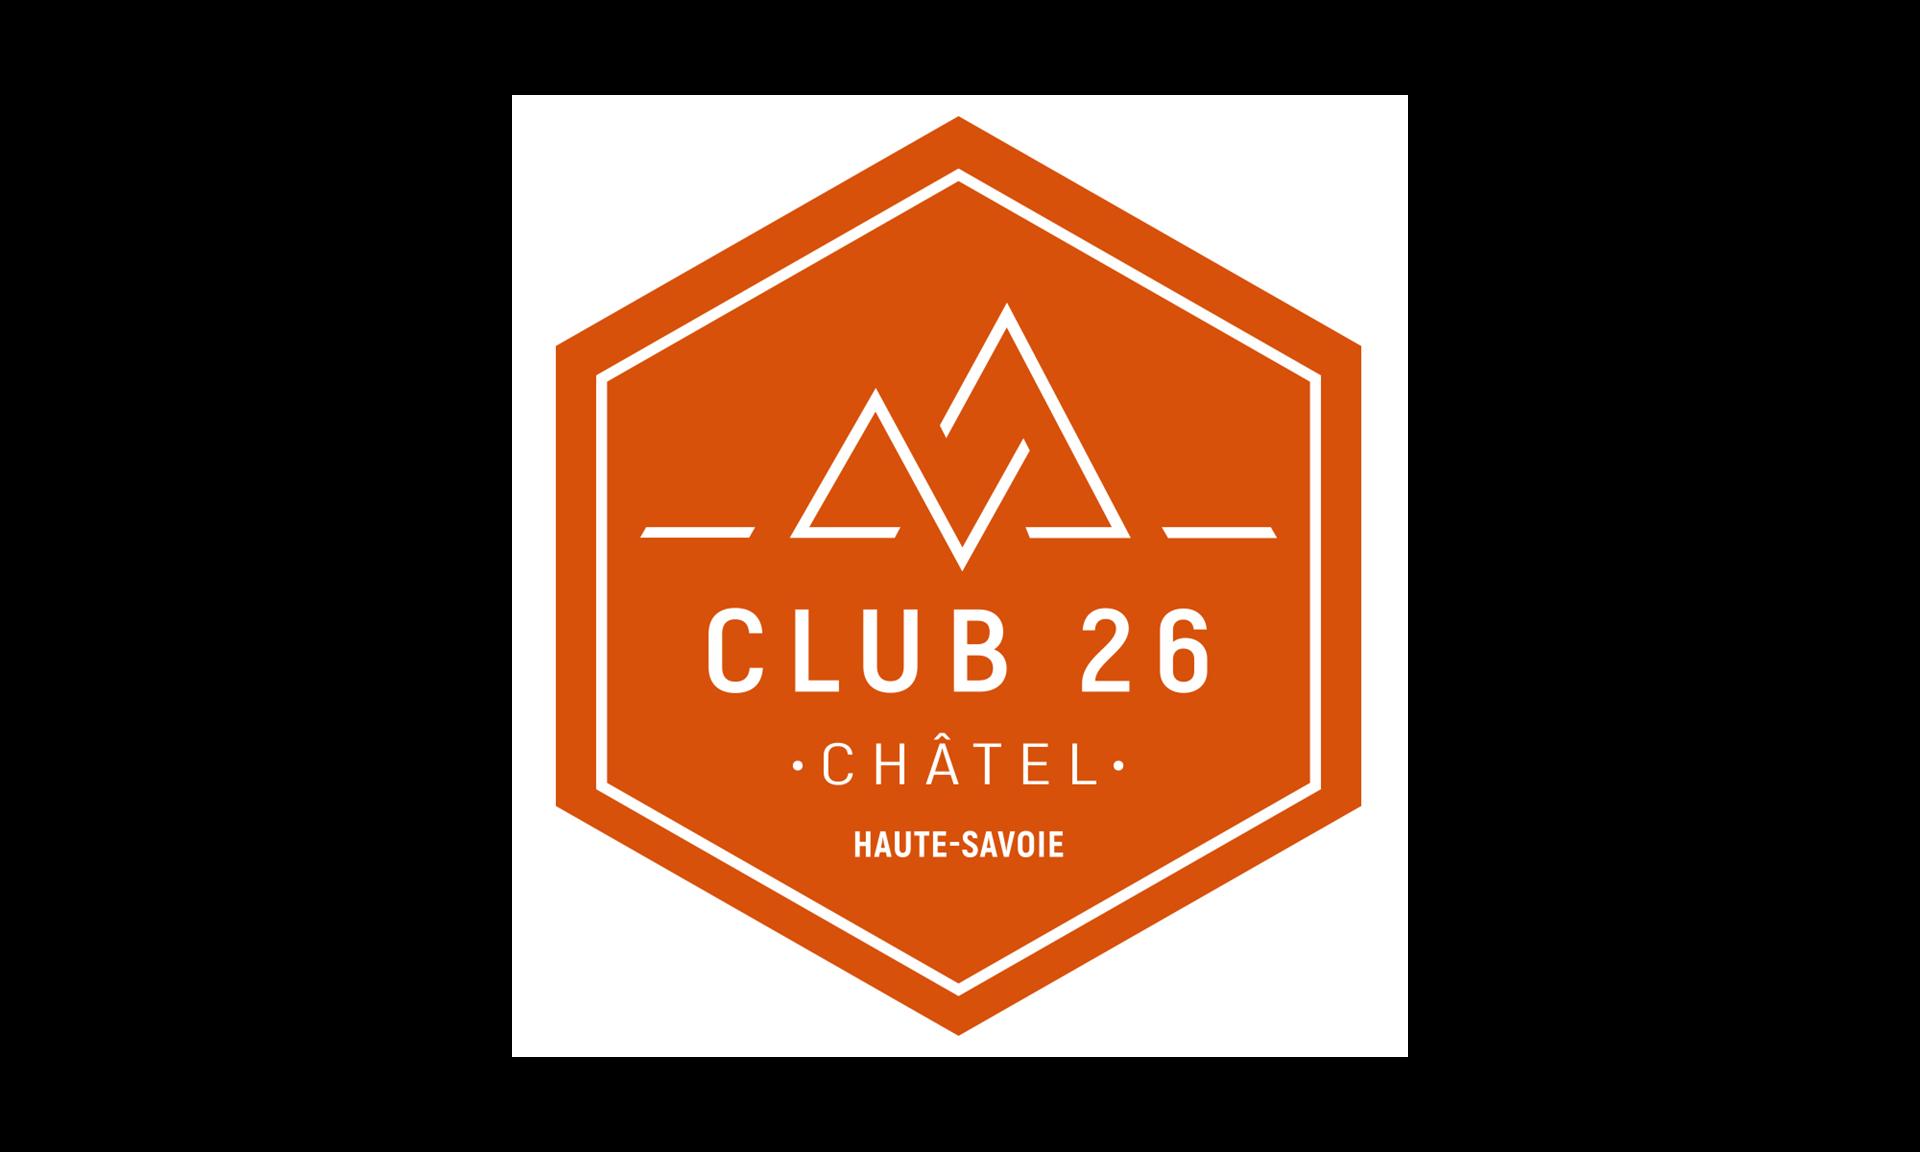 Club 26